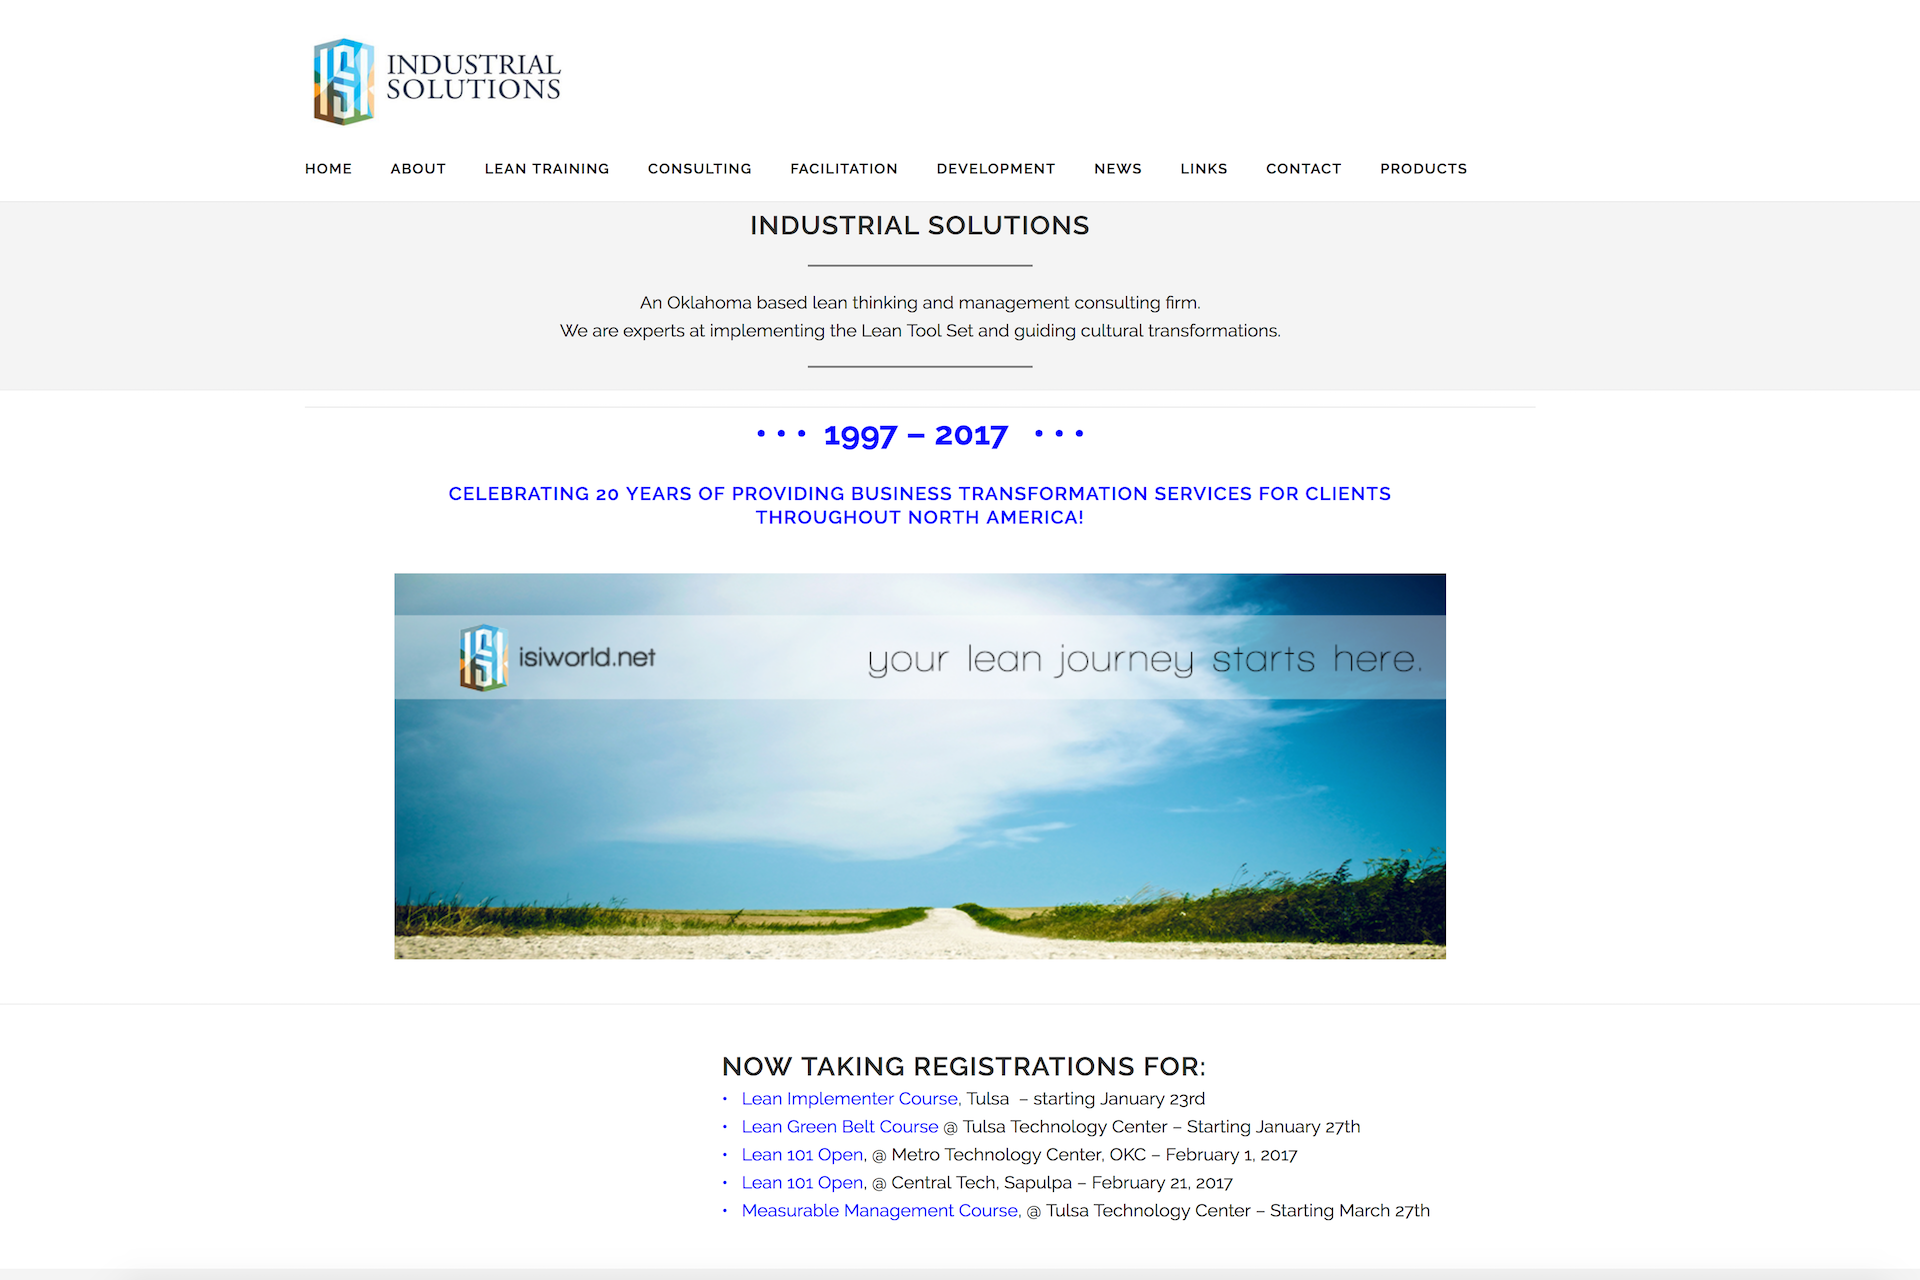 Portfolio Seo Website Design Portfolio Website Design Portfolio